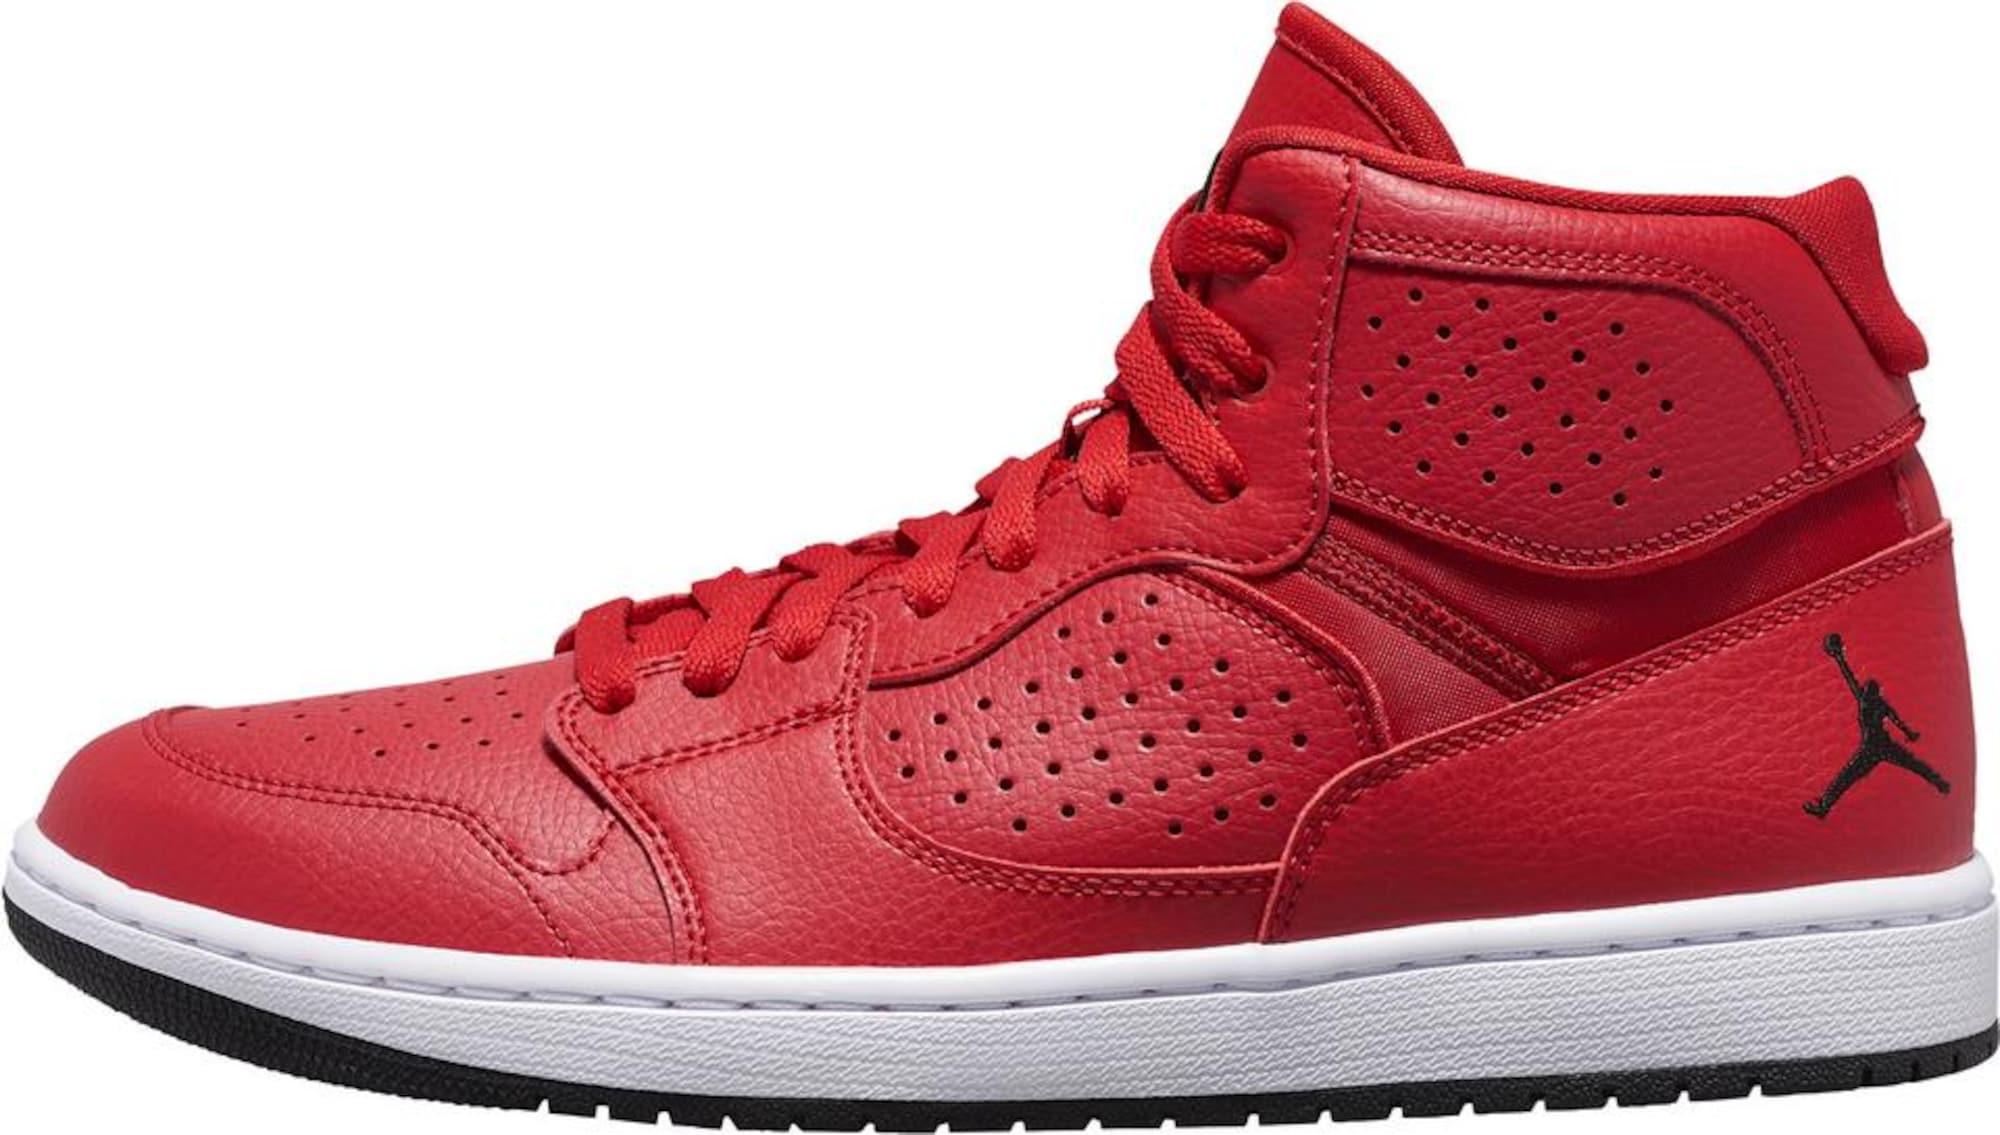 Basketballschuhe 'JORDAN ACCESS' | Schuhe > Sportschuhe > Basketballschuhe | Rot | Nike